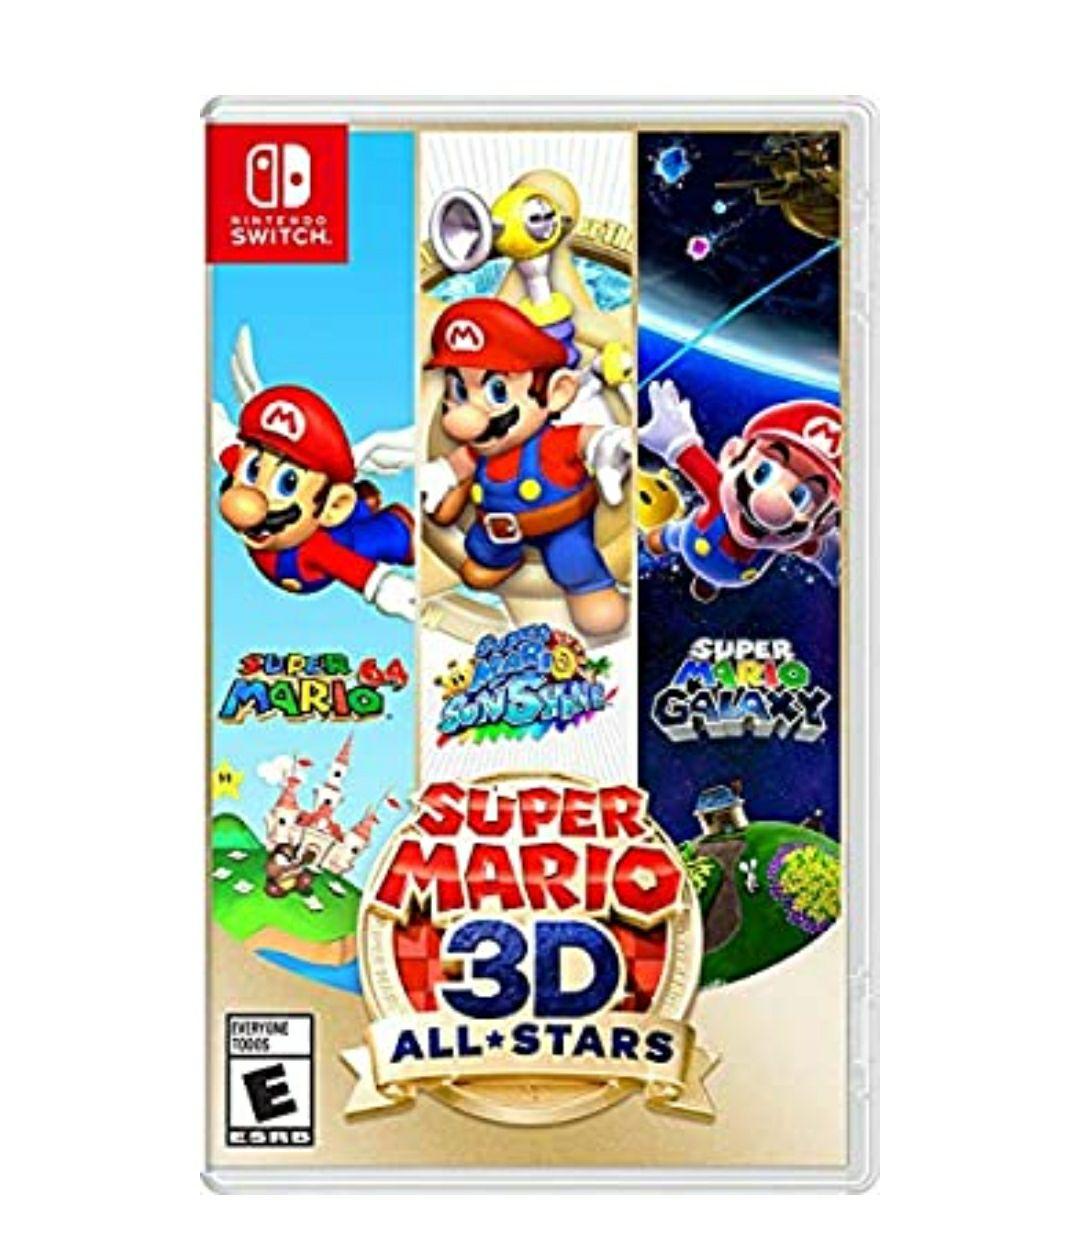 Amazon: Super Mario 3D All Stars - Nintendo Switch